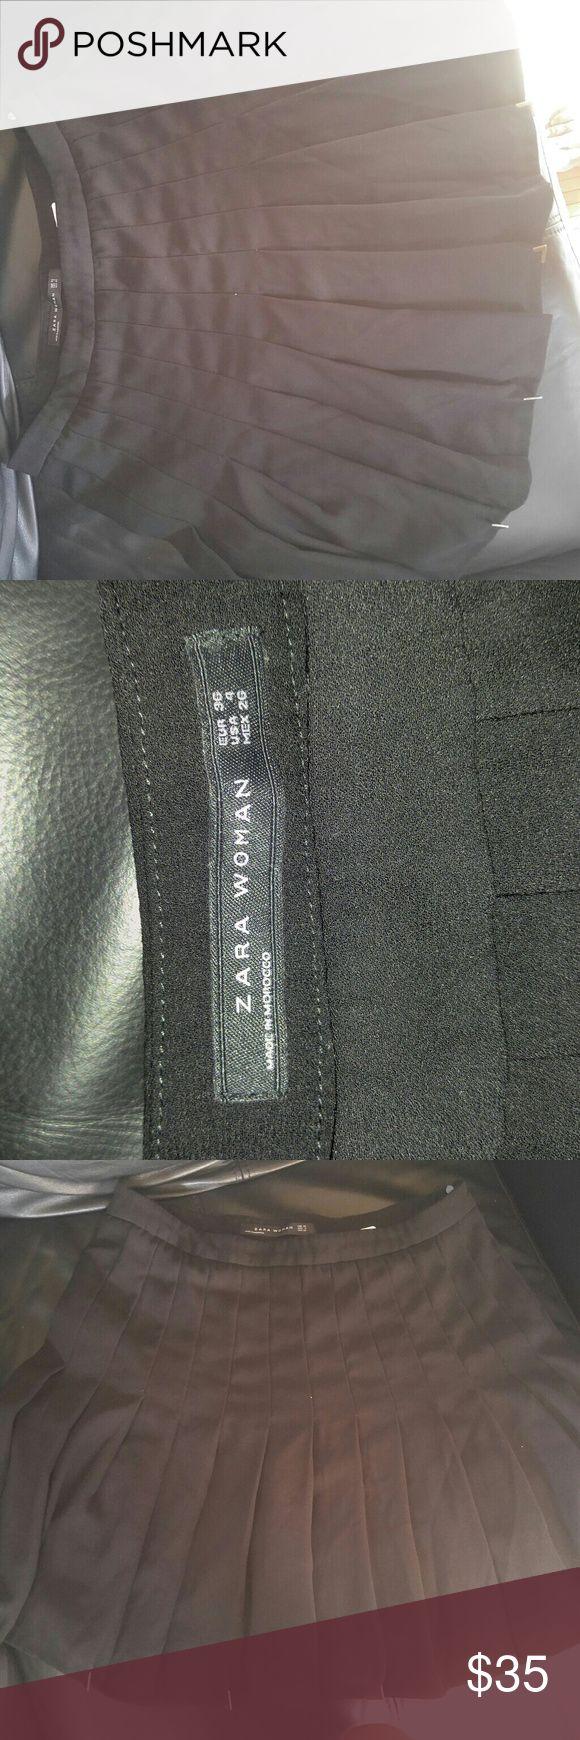 Zara skirt A black pleated schoolgirl skirt has some gold trim at the bottom. Zara Skirts Midi